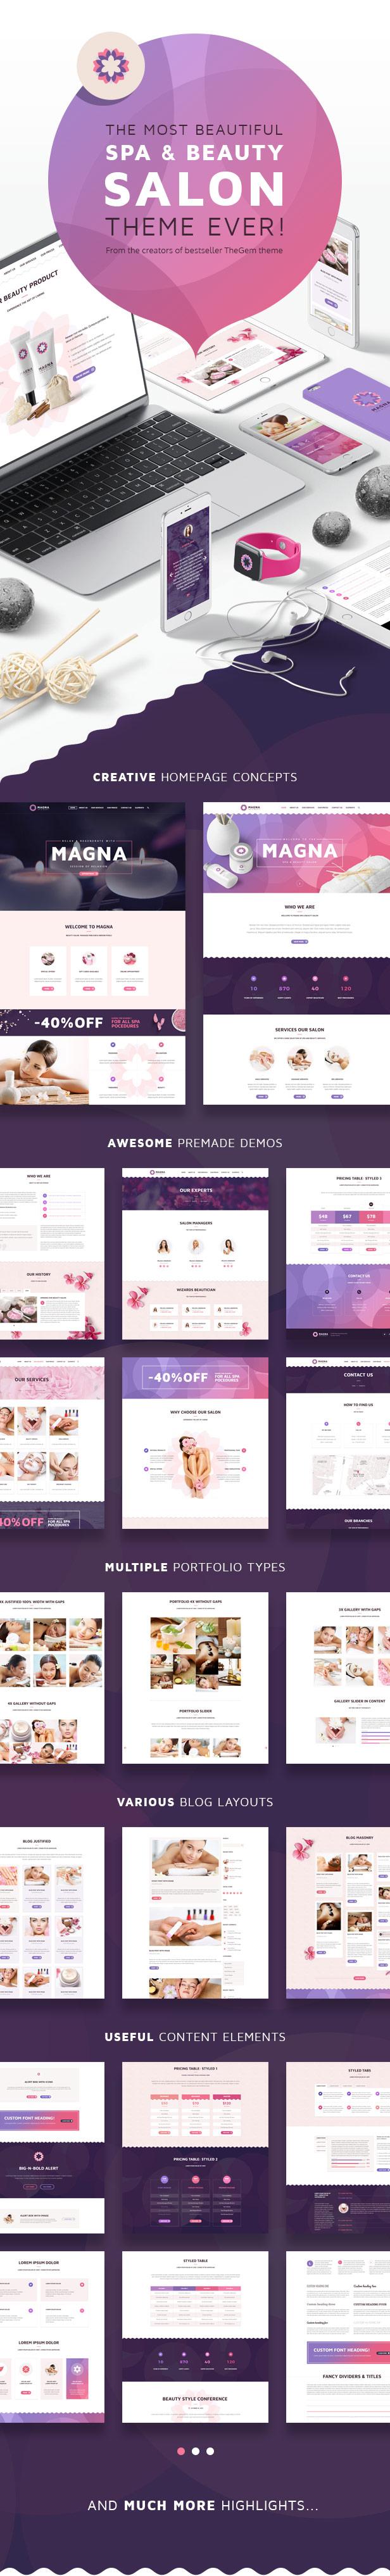 magna2 - Magna - Spa Beauty Salon, Beauty & Spa, Health & Wellness WordPress Theme